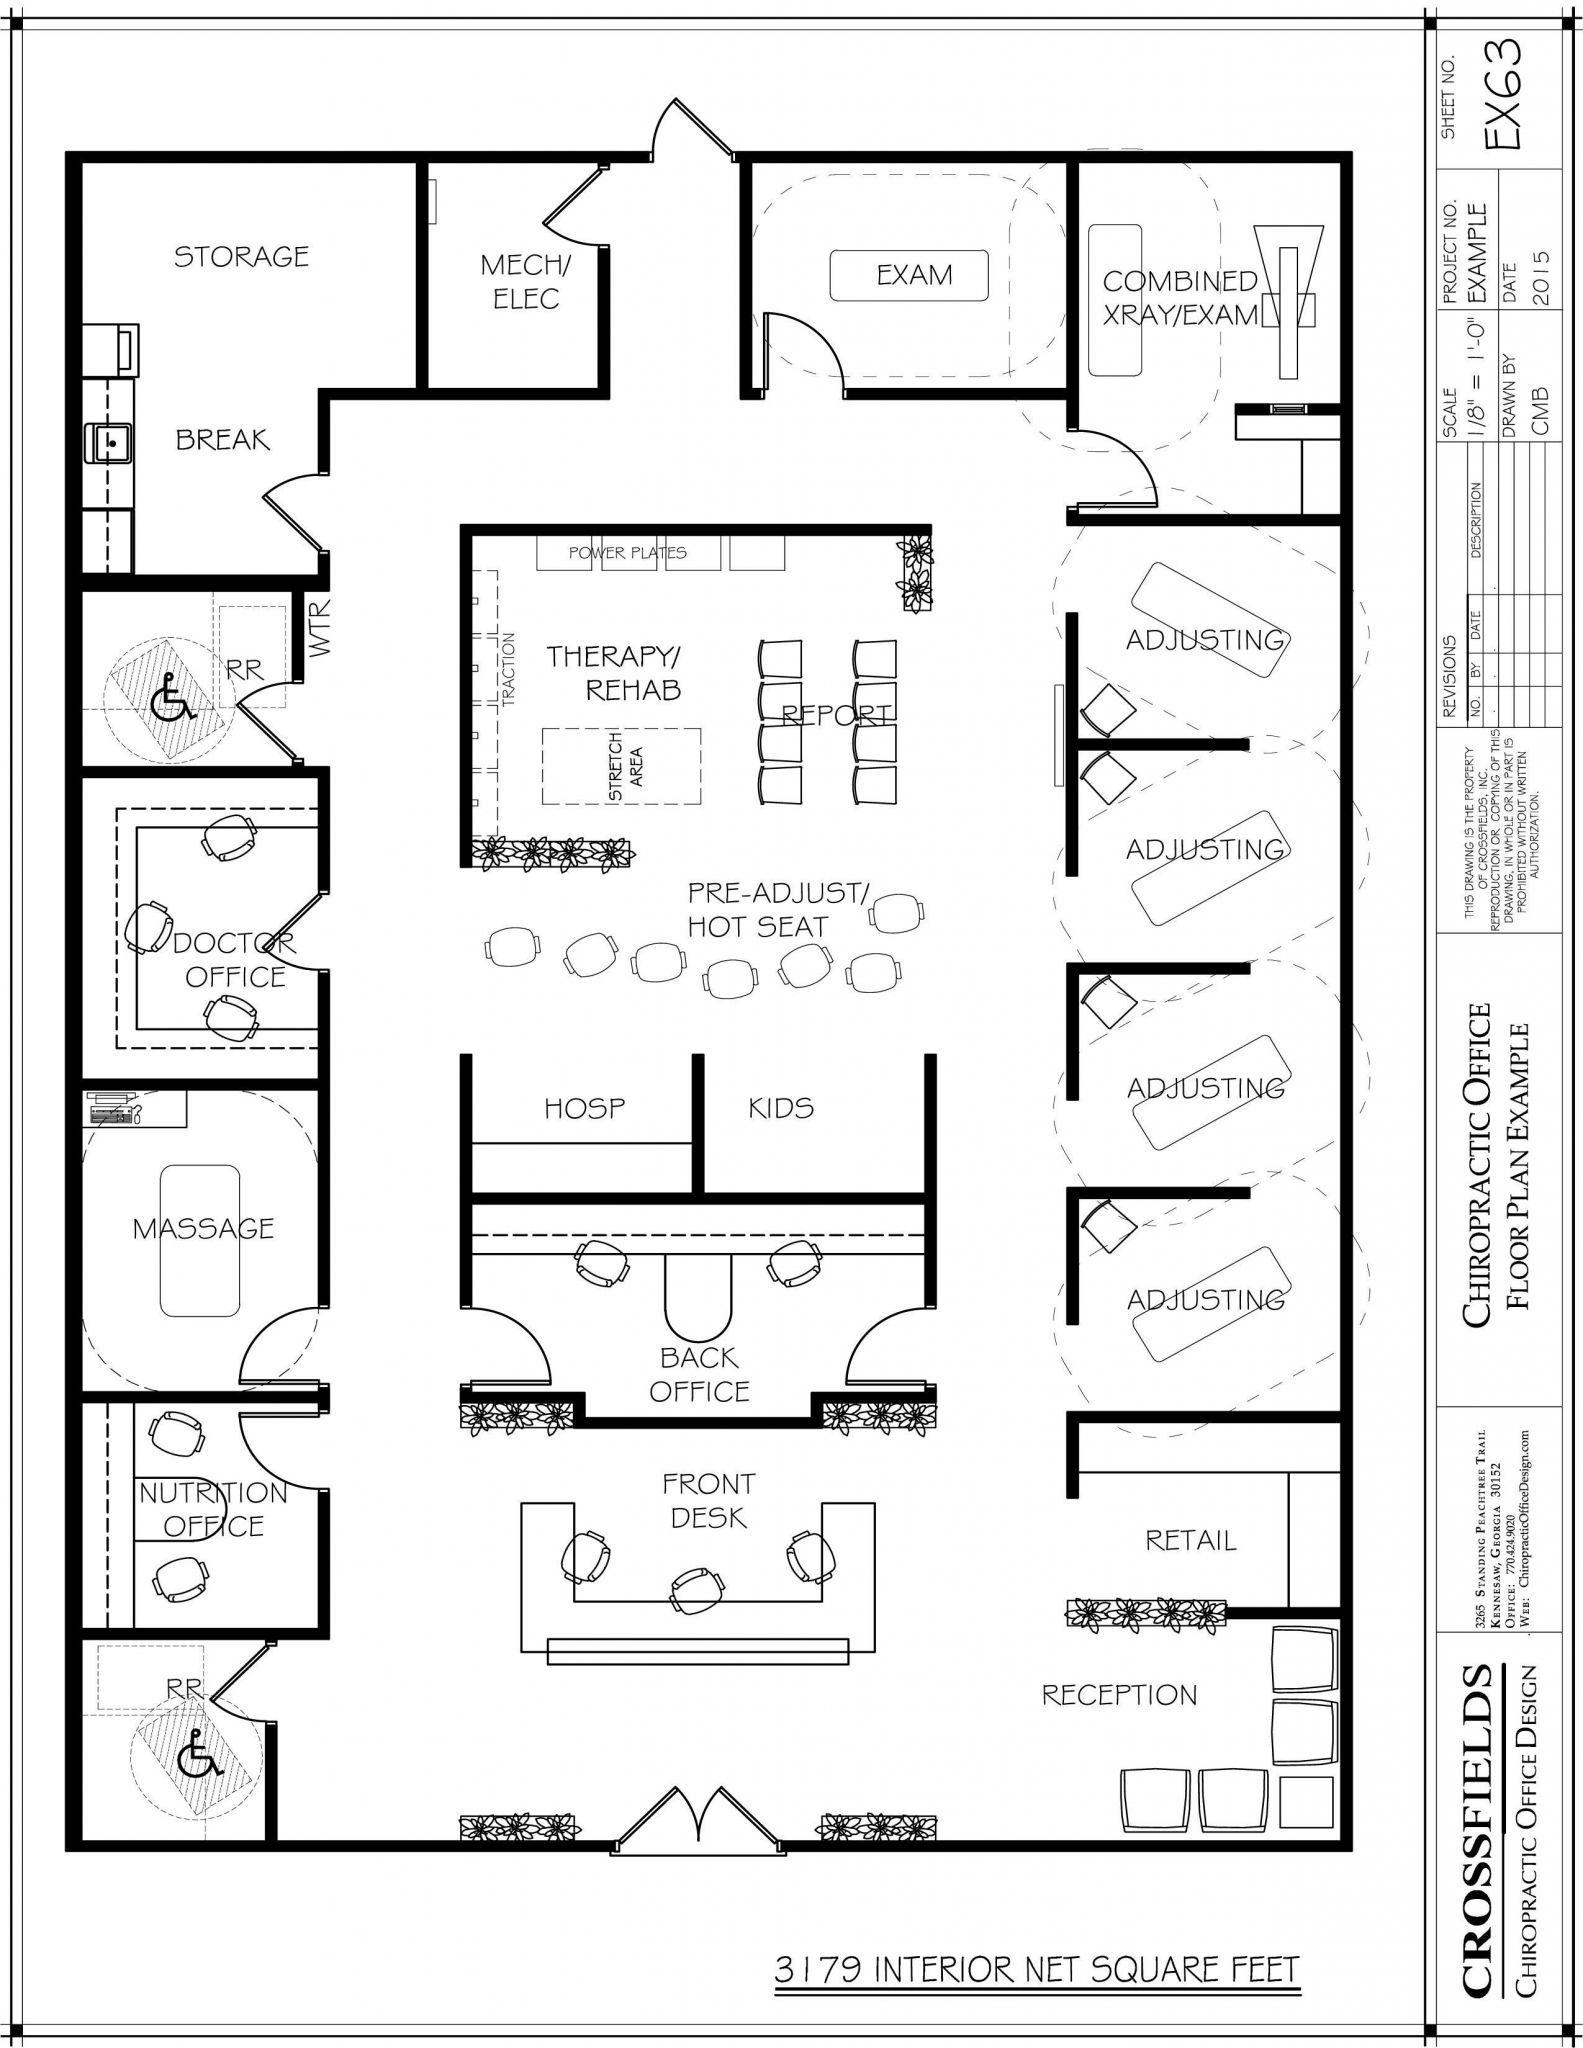 Medical Clinic Floor Plan Design Sample Unique Chiropractic